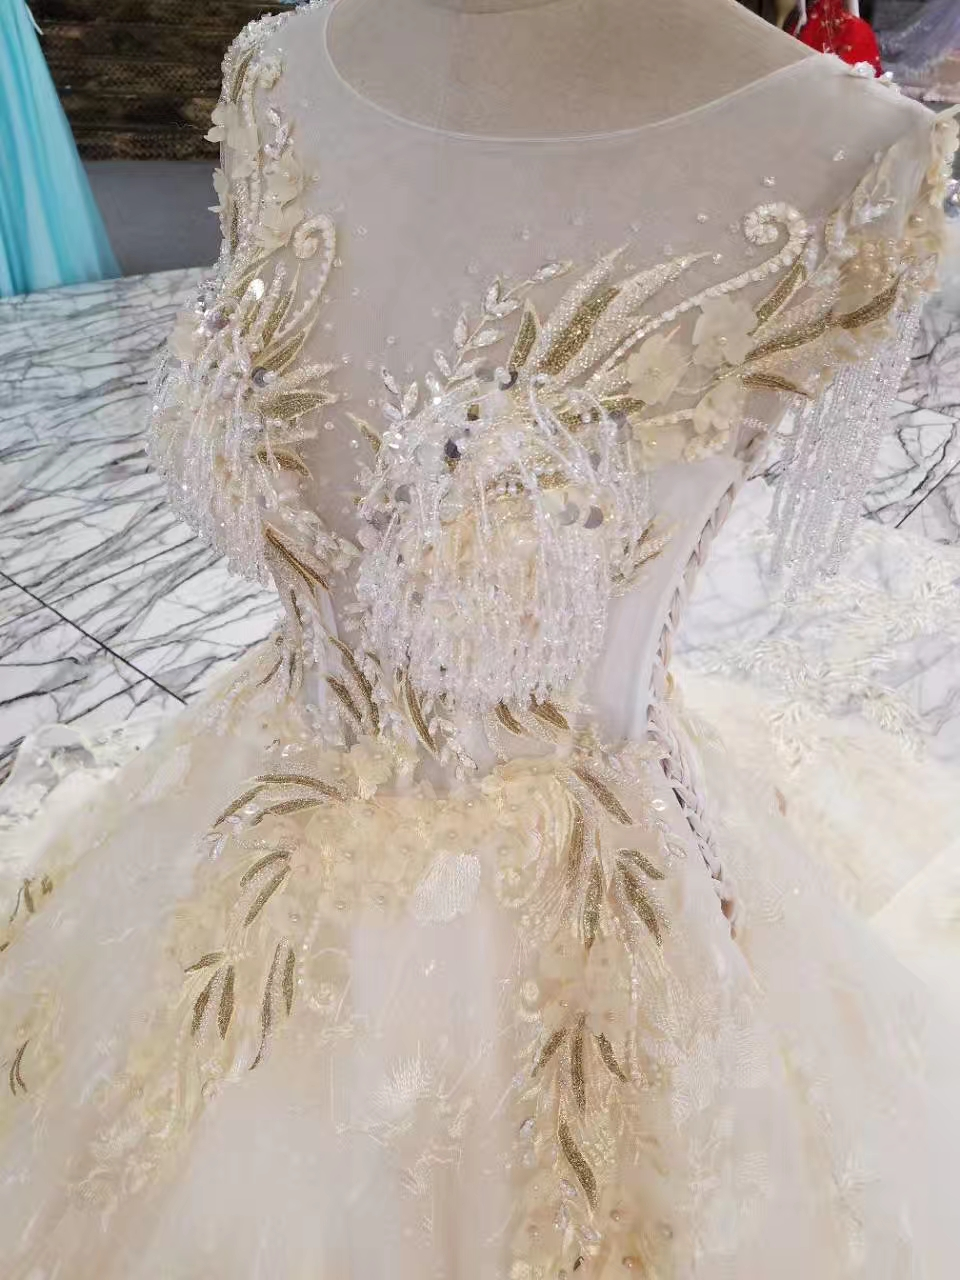 Lace Crystals de lux Margele de aplicatii rochie de mireasa rochie de - Rochii de mireasa - Fotografie 4